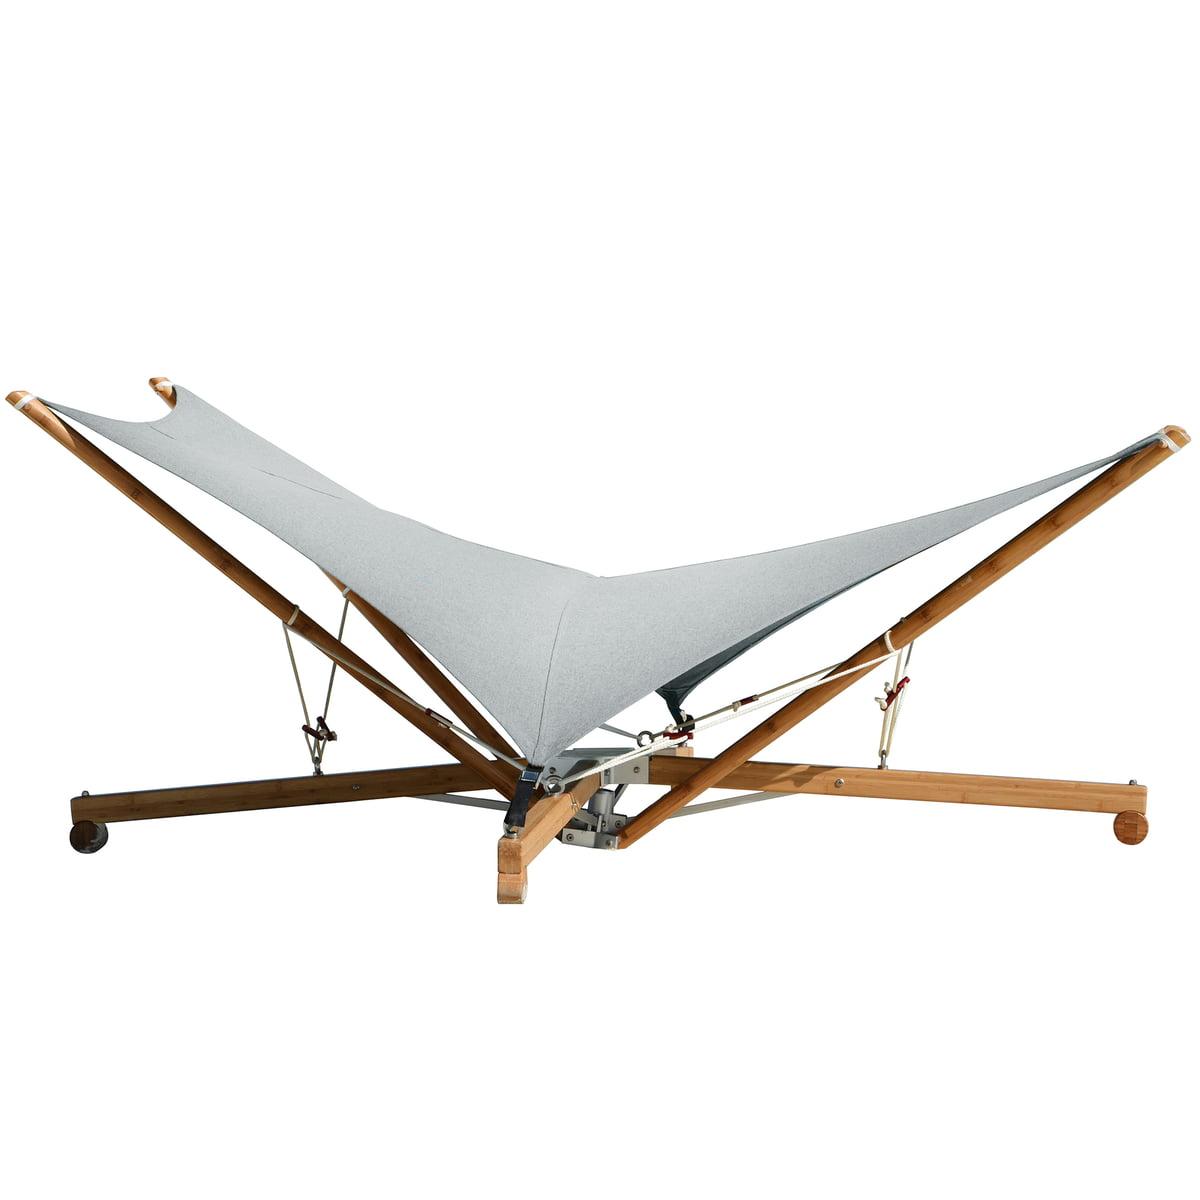 Cacoon - Kajito Hängematte / Liegestuhl, Bambusstruktur, Stoff earth / moon | Garten > Hängematten | Cacoon